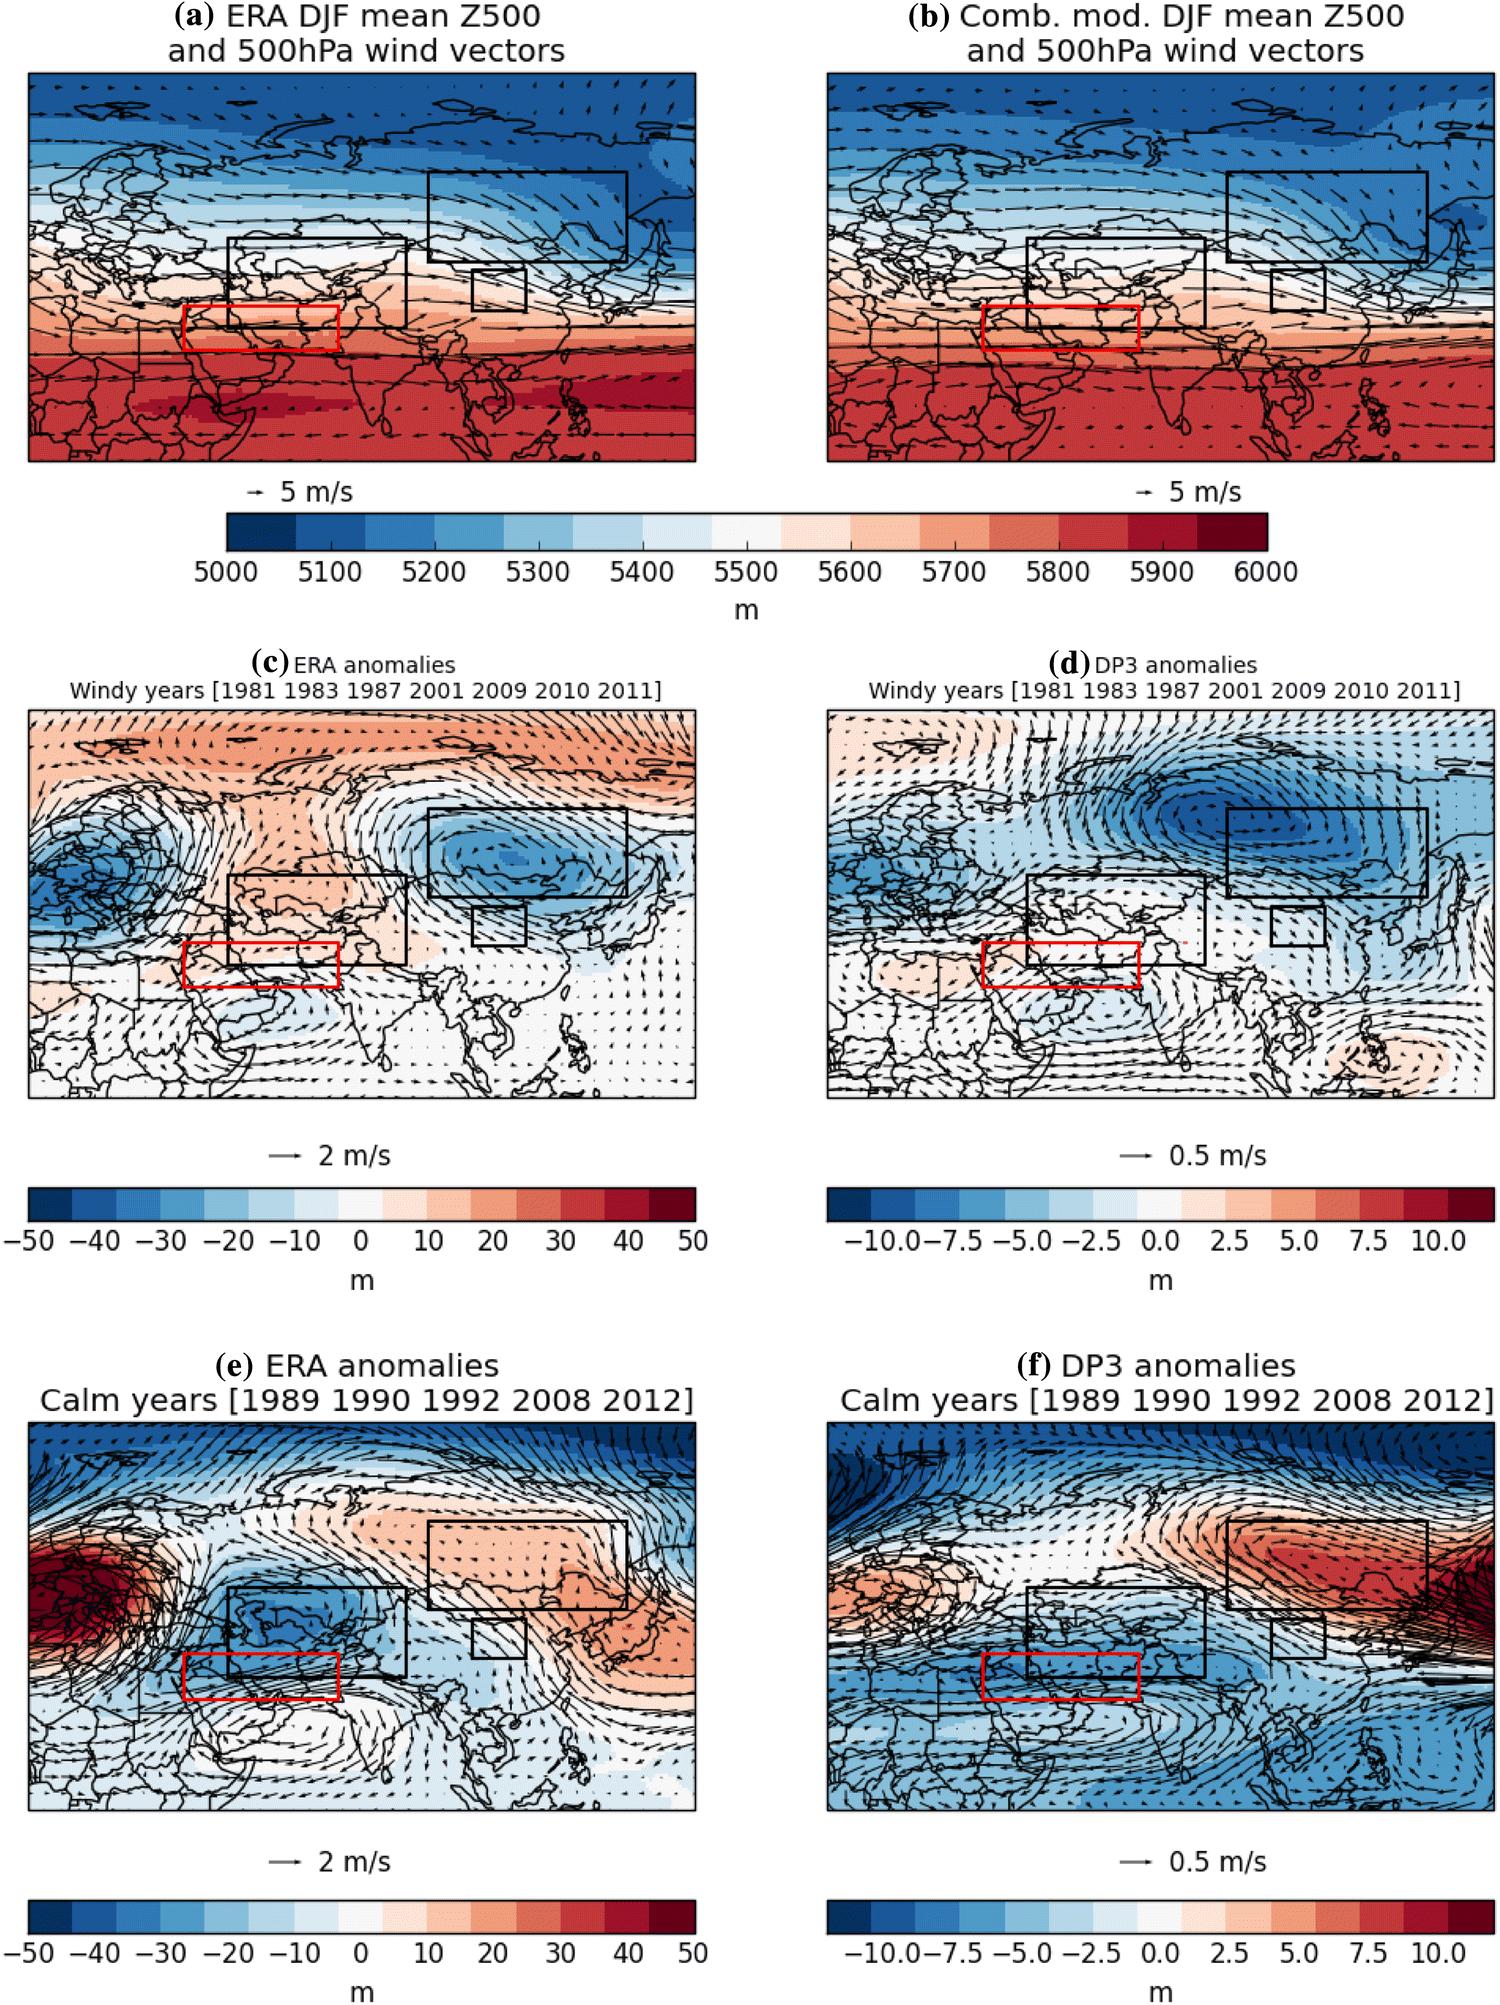 Skilful seasonal prediction of winter wind speeds in China